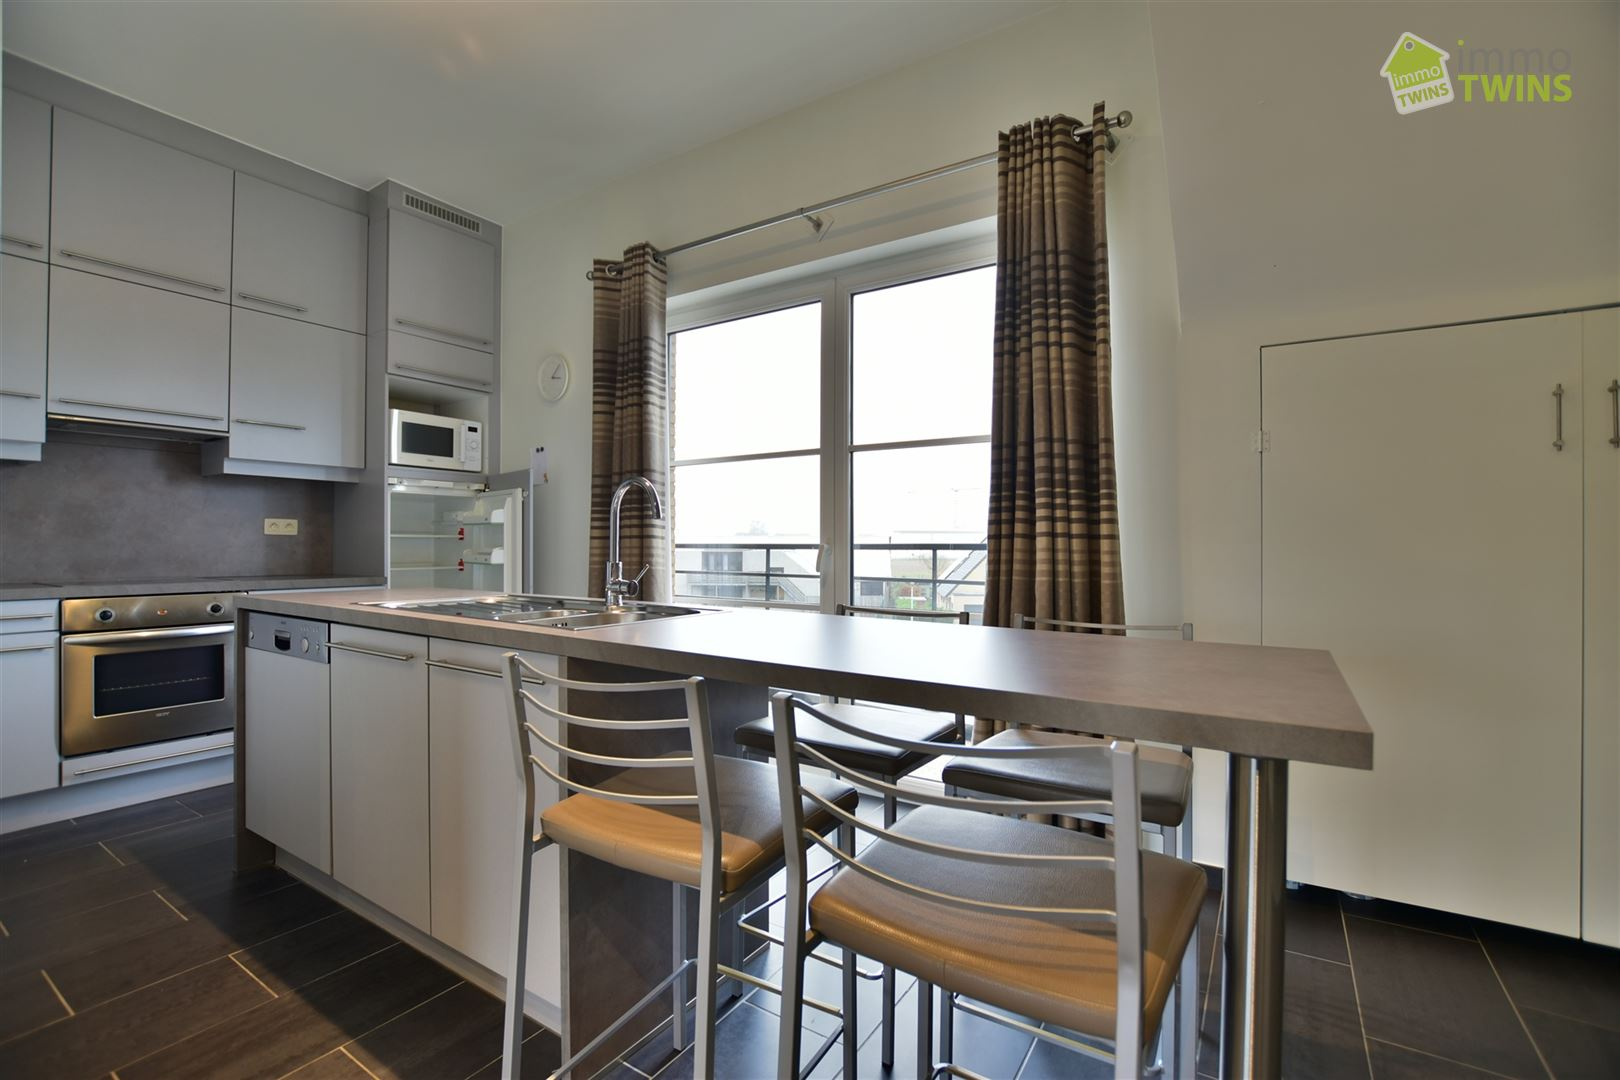 Foto 10 : Appartement te 9200 BAASRODE (België) - Prijs € 650